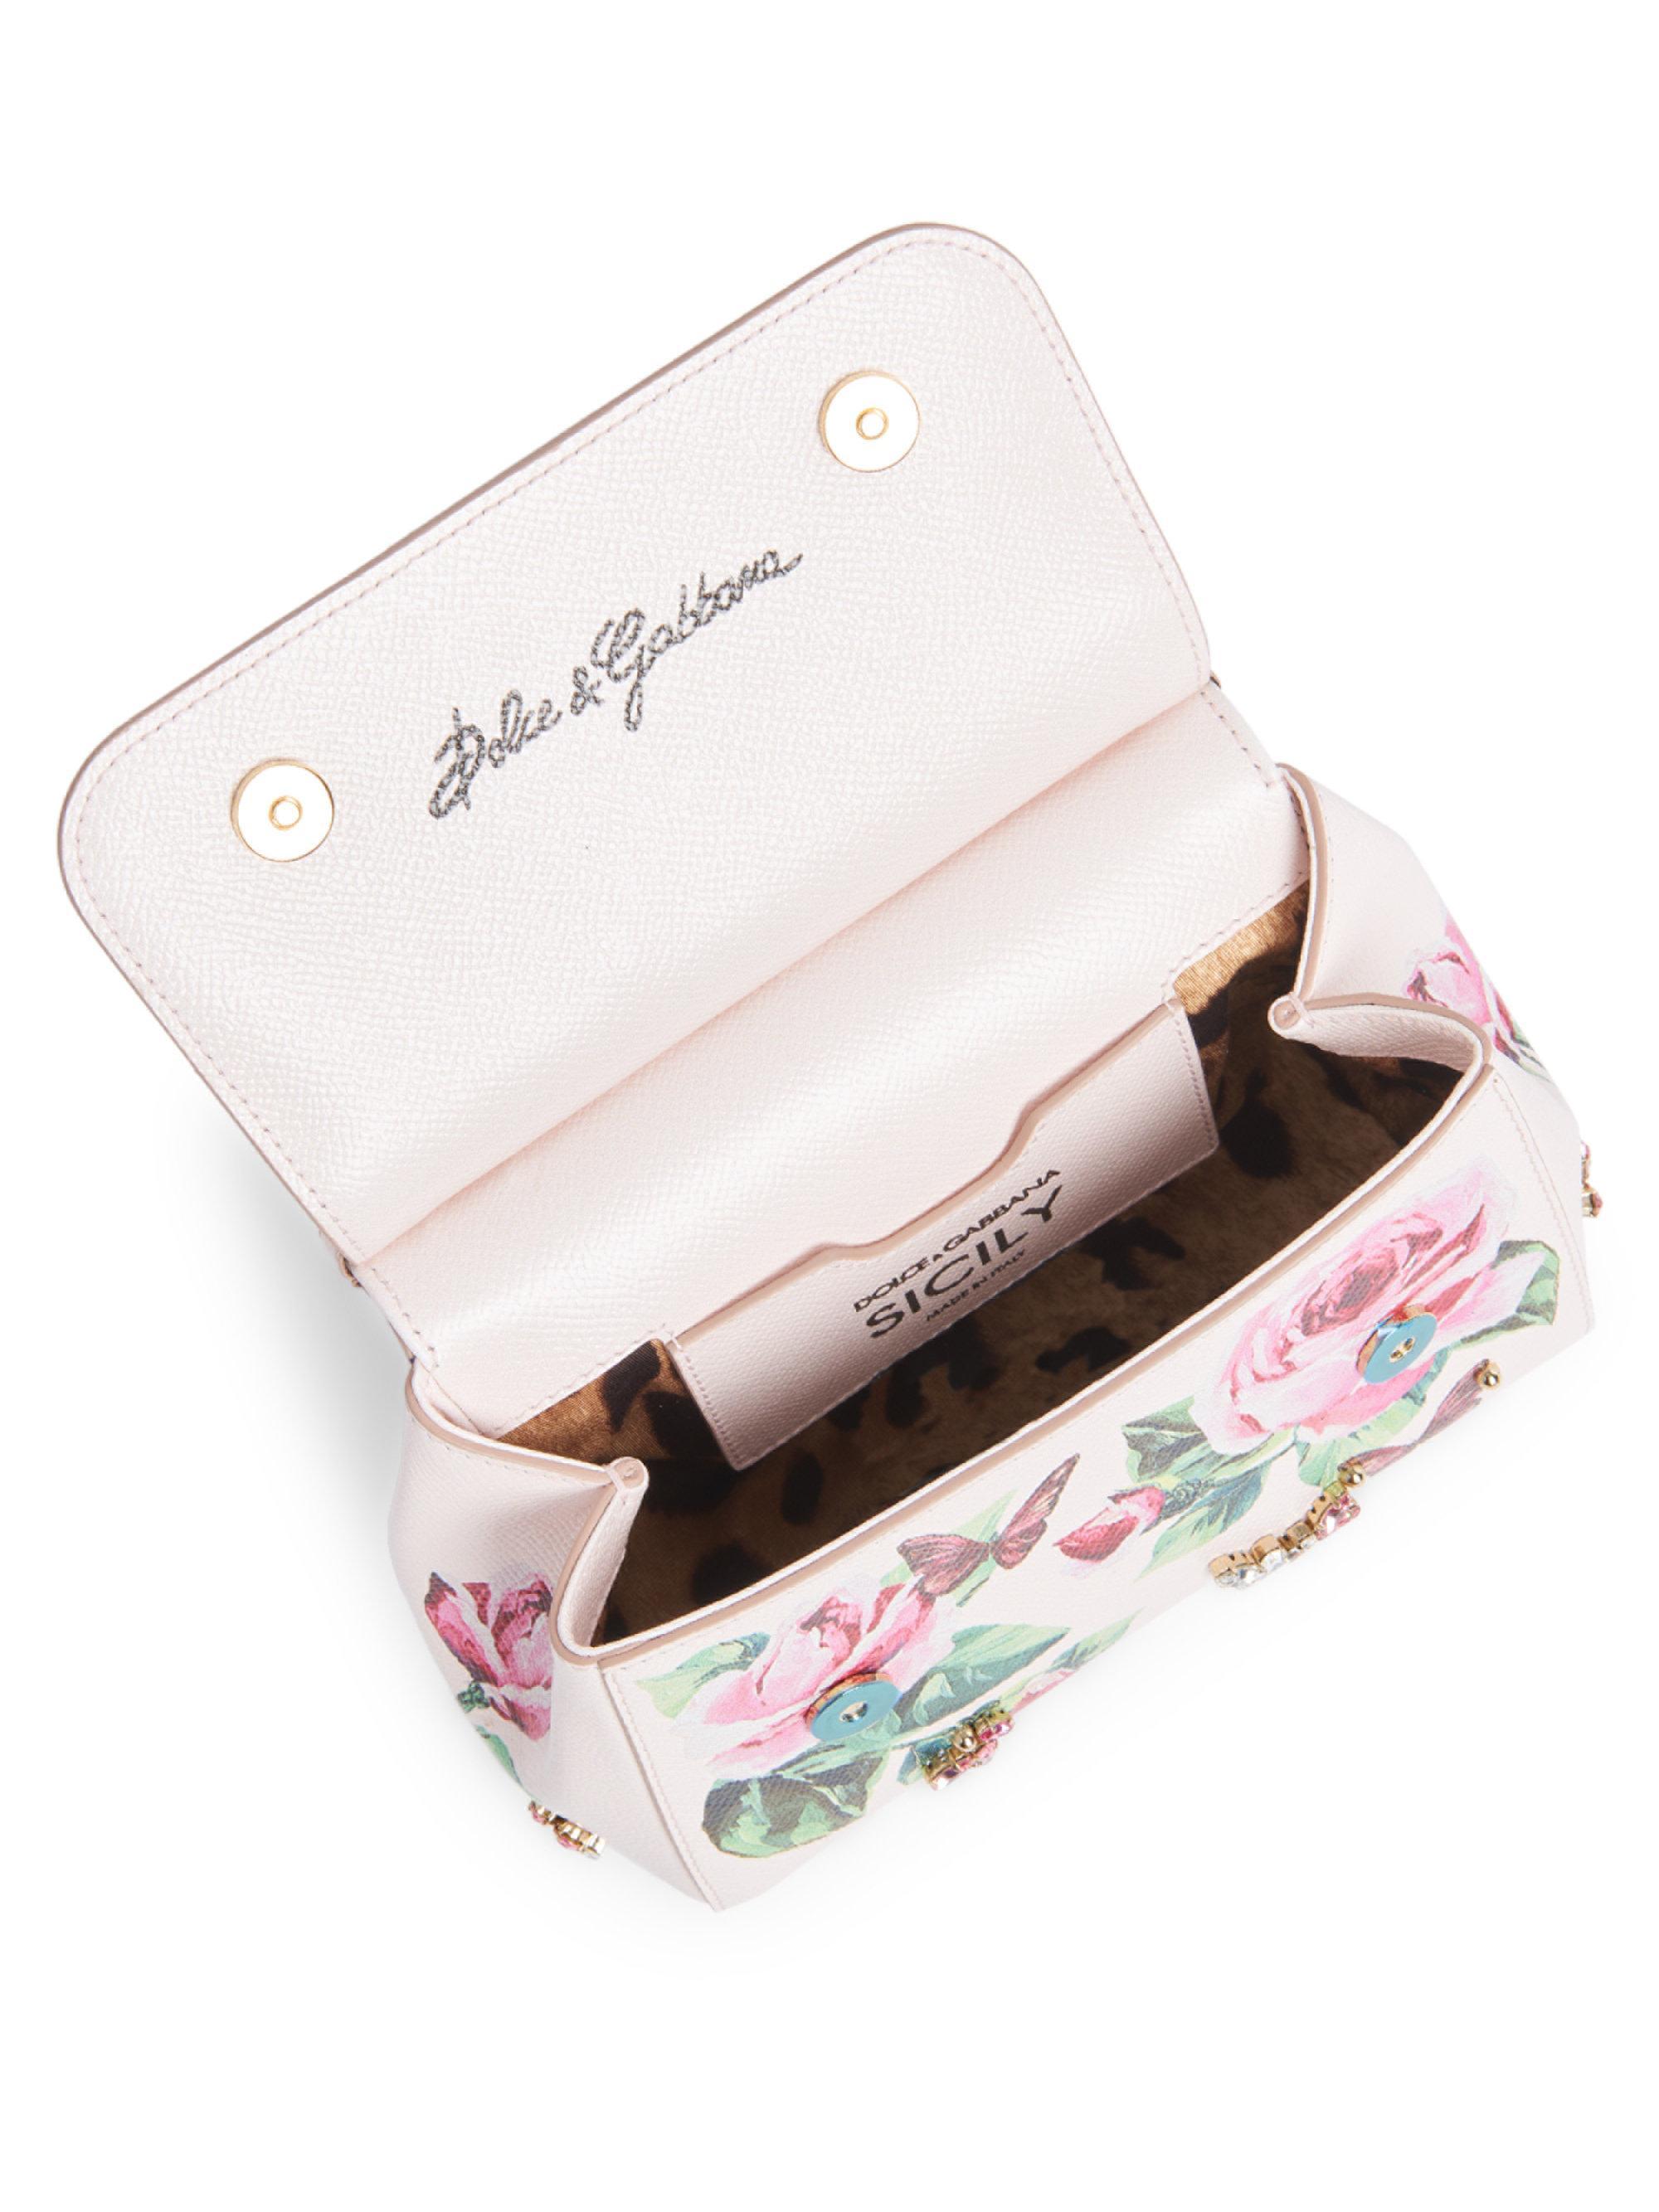 64900170 Dolce & Gabbana Rose & Butterfly Print Shoulder Bag in White - Lyst